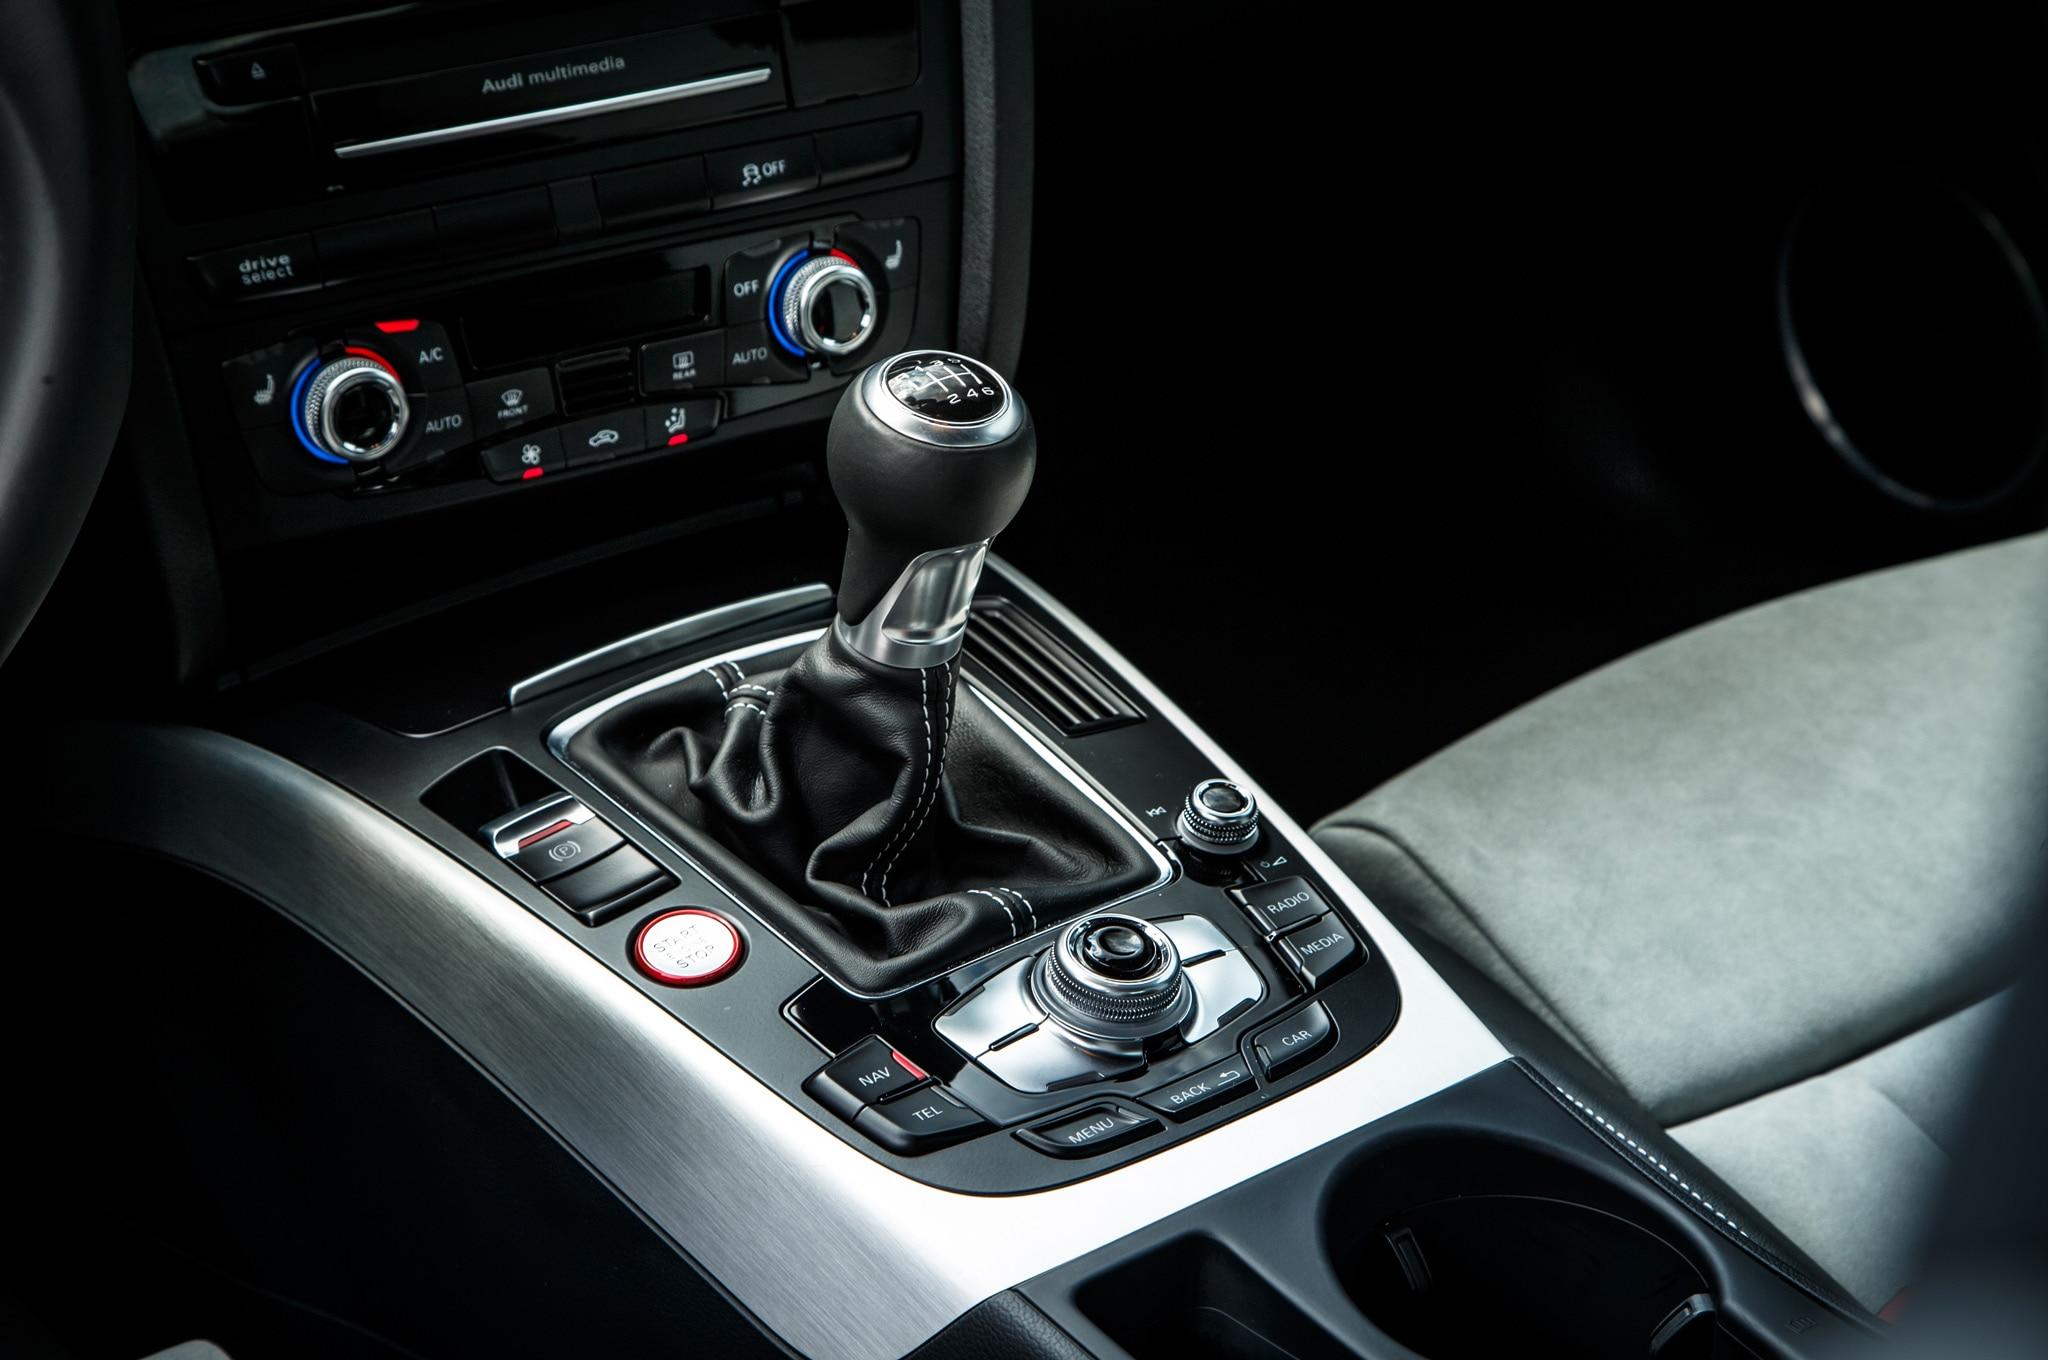 manual stick shift audi enthusiast wiring diagrams u2022 rh rasalibre co 2005 Audi Quattro Manual Transmission 2014 Audi A5 Black